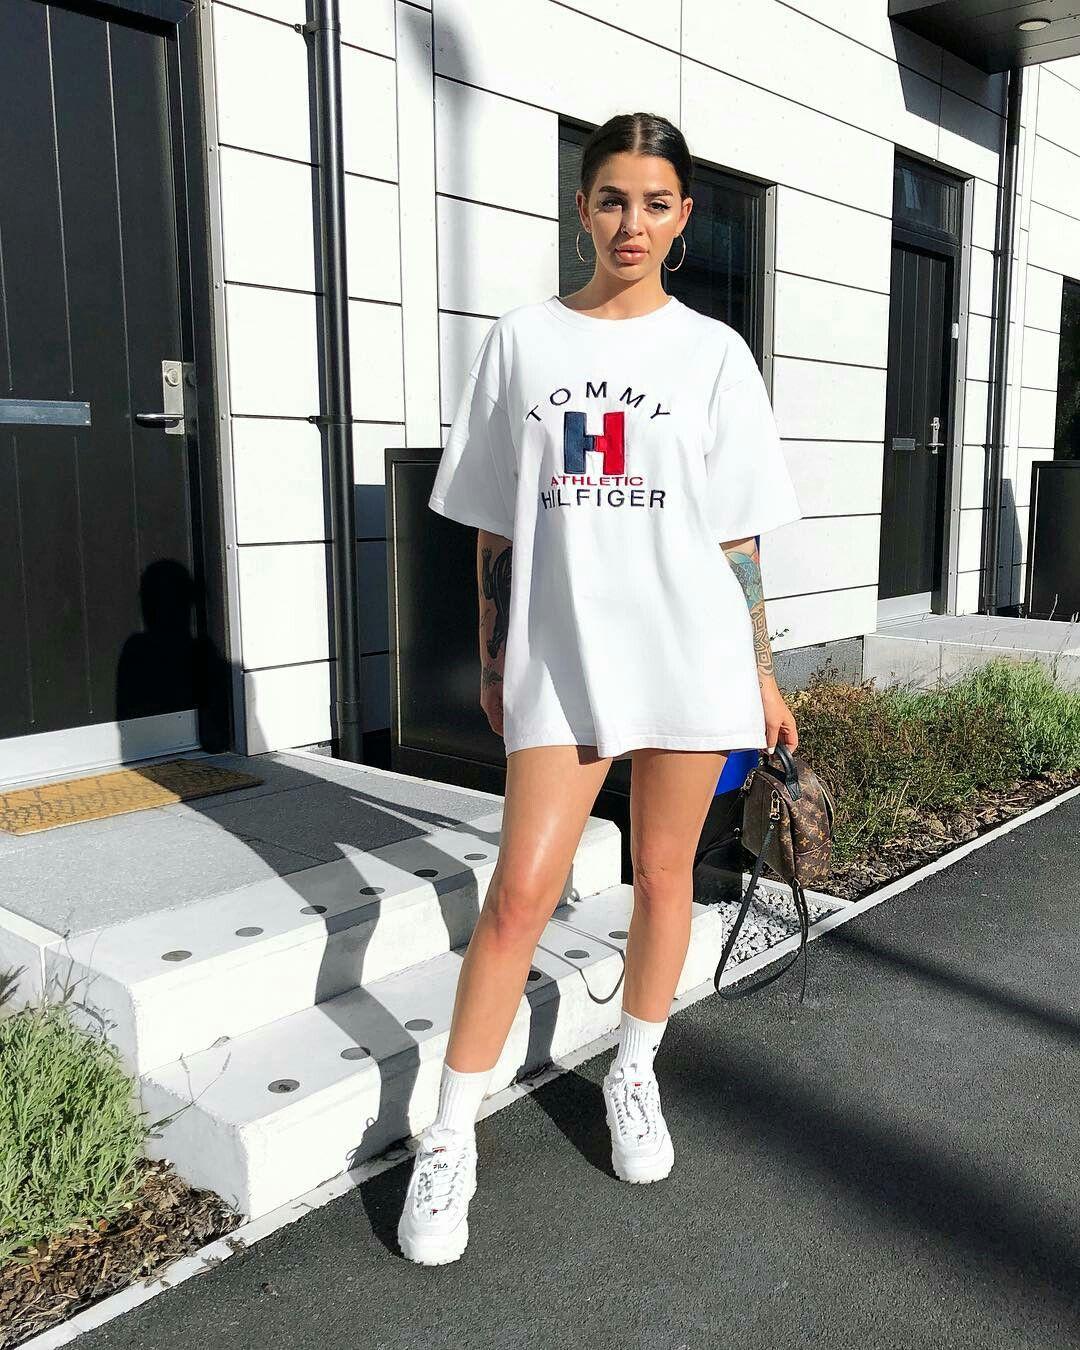 Pinterest Rebelxo7 Tshirt Dress Outfit Oversized T Shirt Dress Oversized Shirt Outfit [ 1350 x 1080 Pixel ]